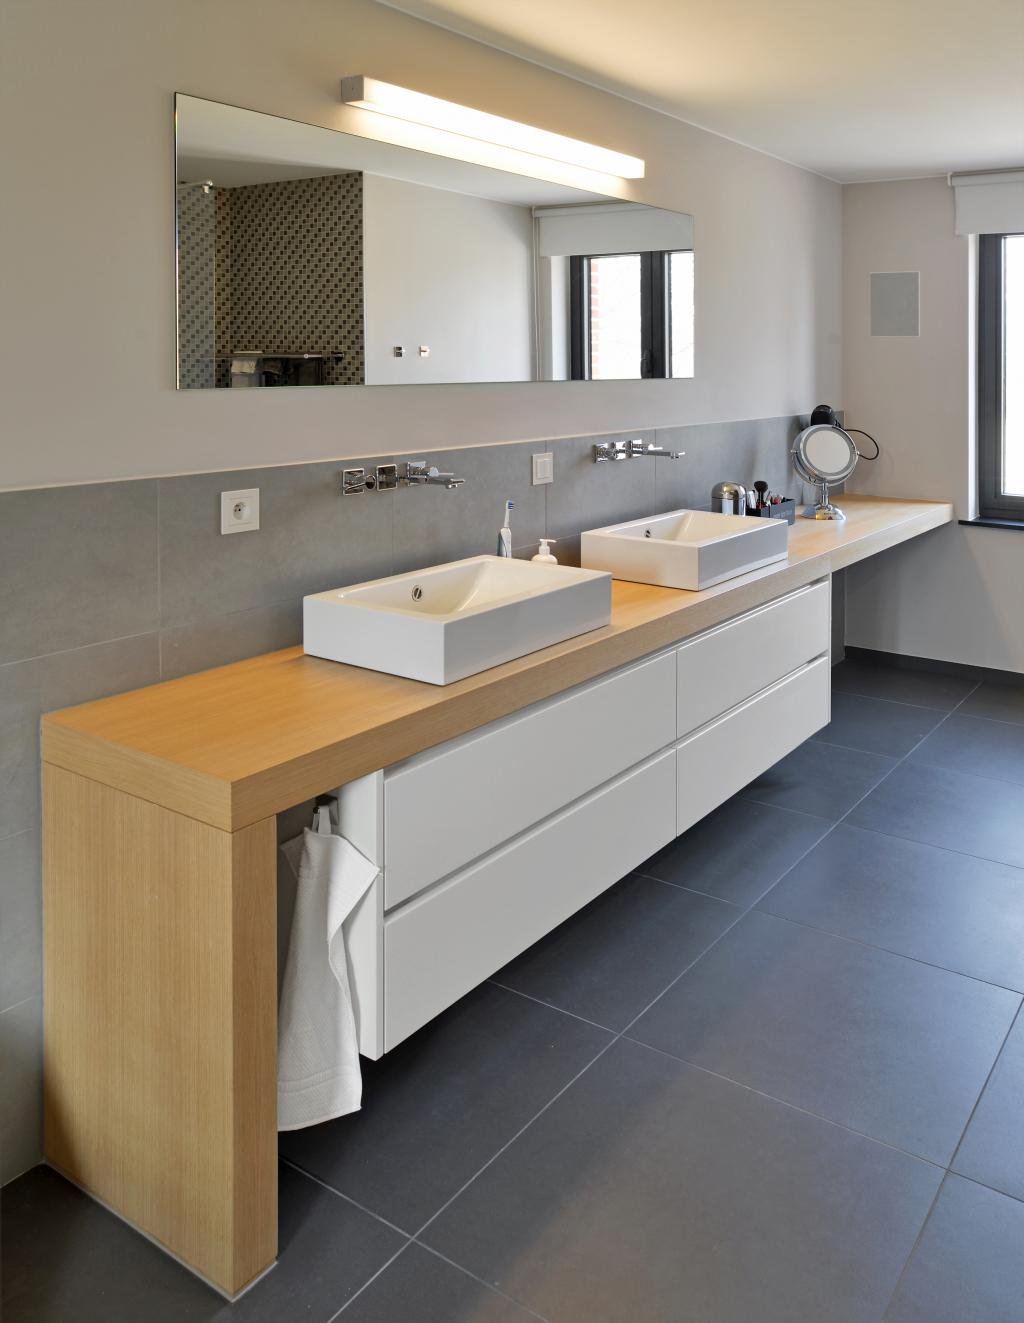 Badkamermeubel Landelijk Modern.Badkamers Gopa Keukens Interieur